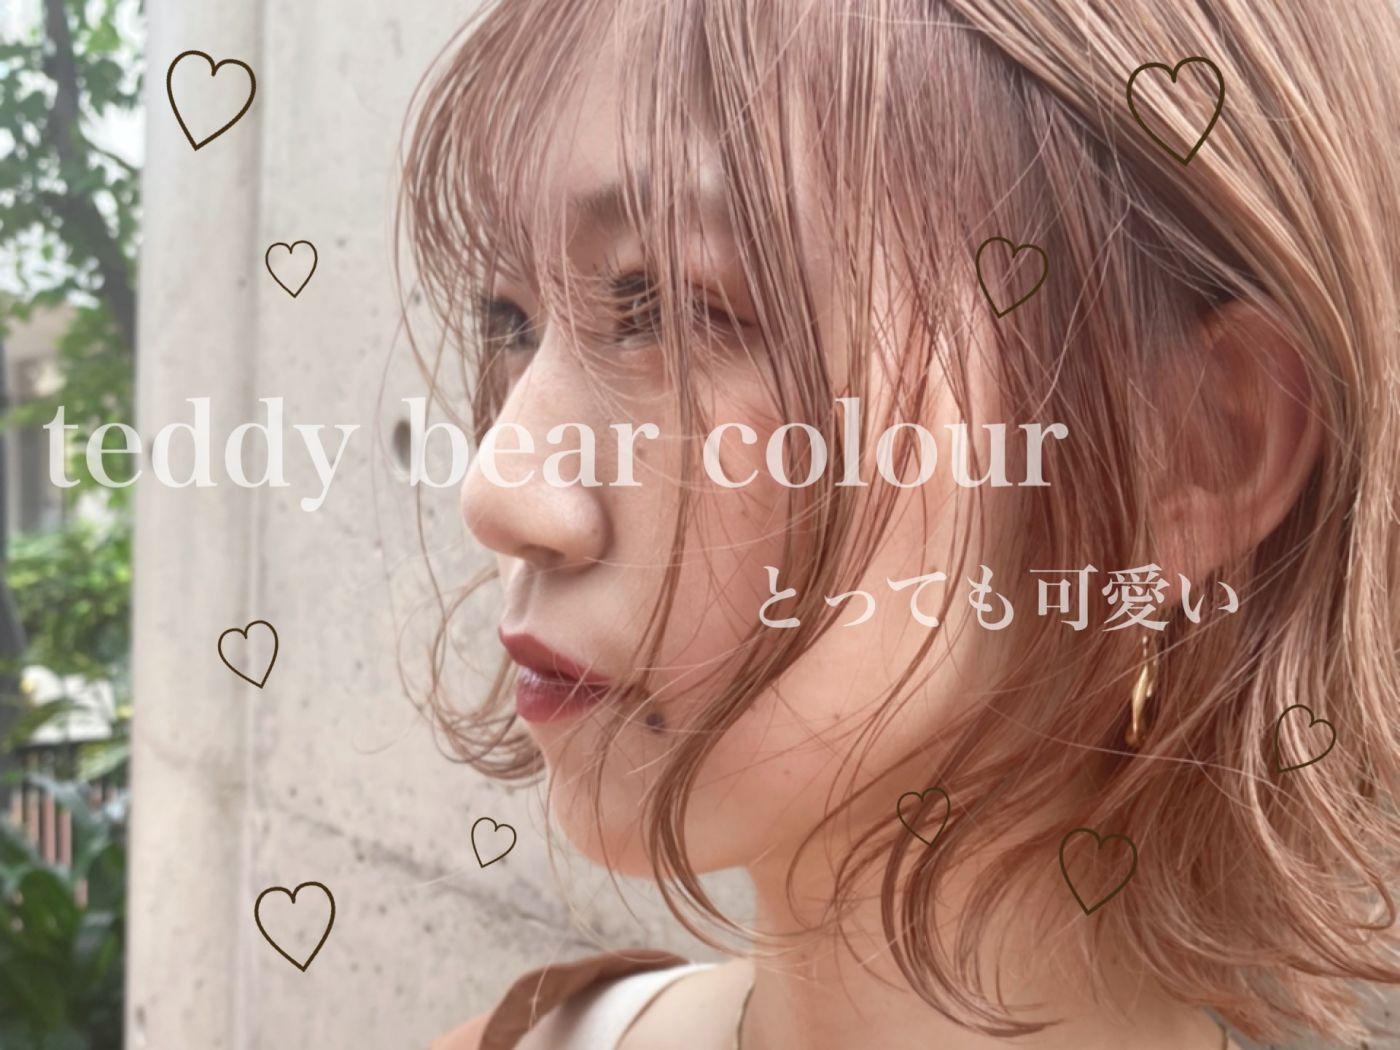 """ teddy bear colour ""がとっても可愛い!!!"